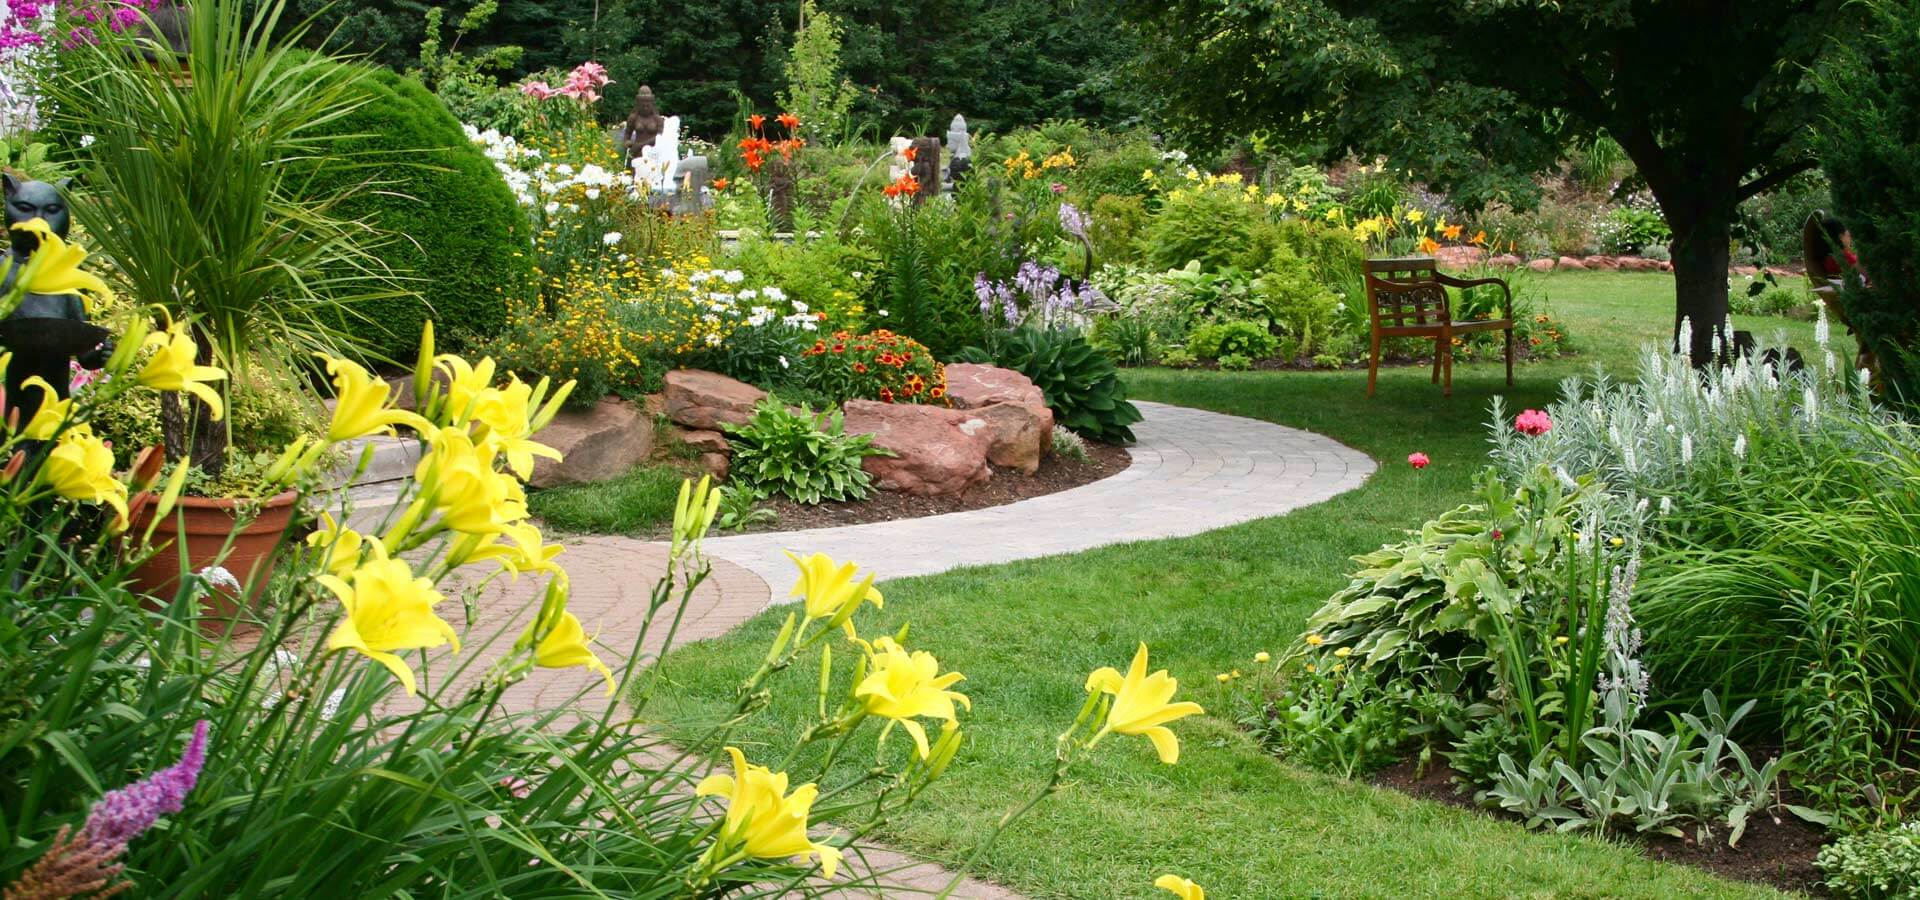 bigstock-Tranquil-Garden-833329-2